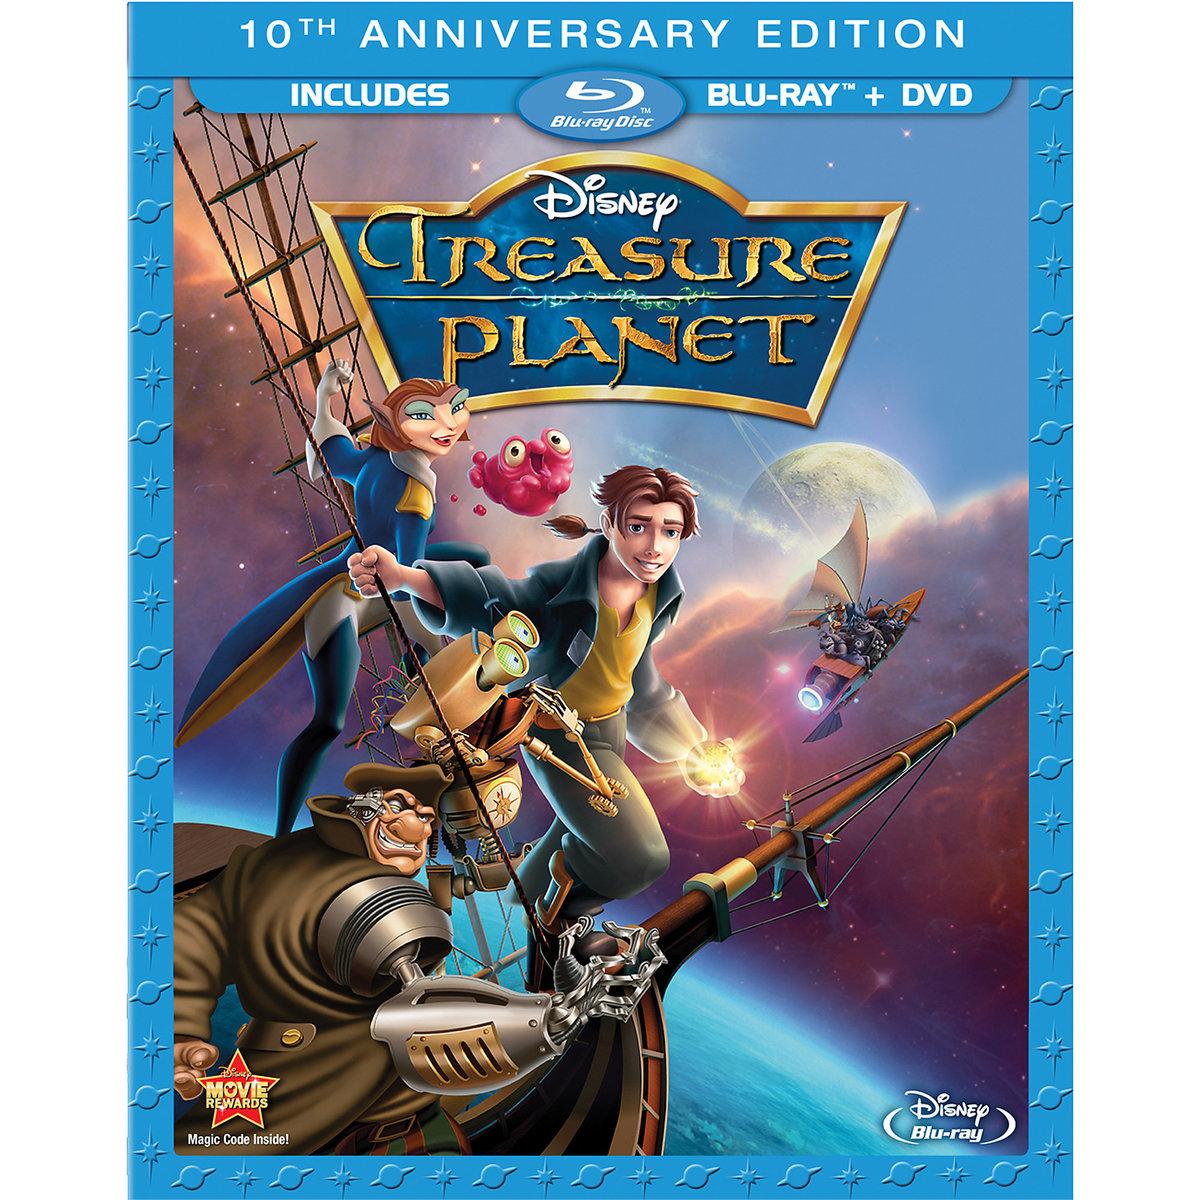 Disney's Treasure Planet: 10th Anniversary Edition (Blu-ray + DVD) $6.45 @ Amazon & Target